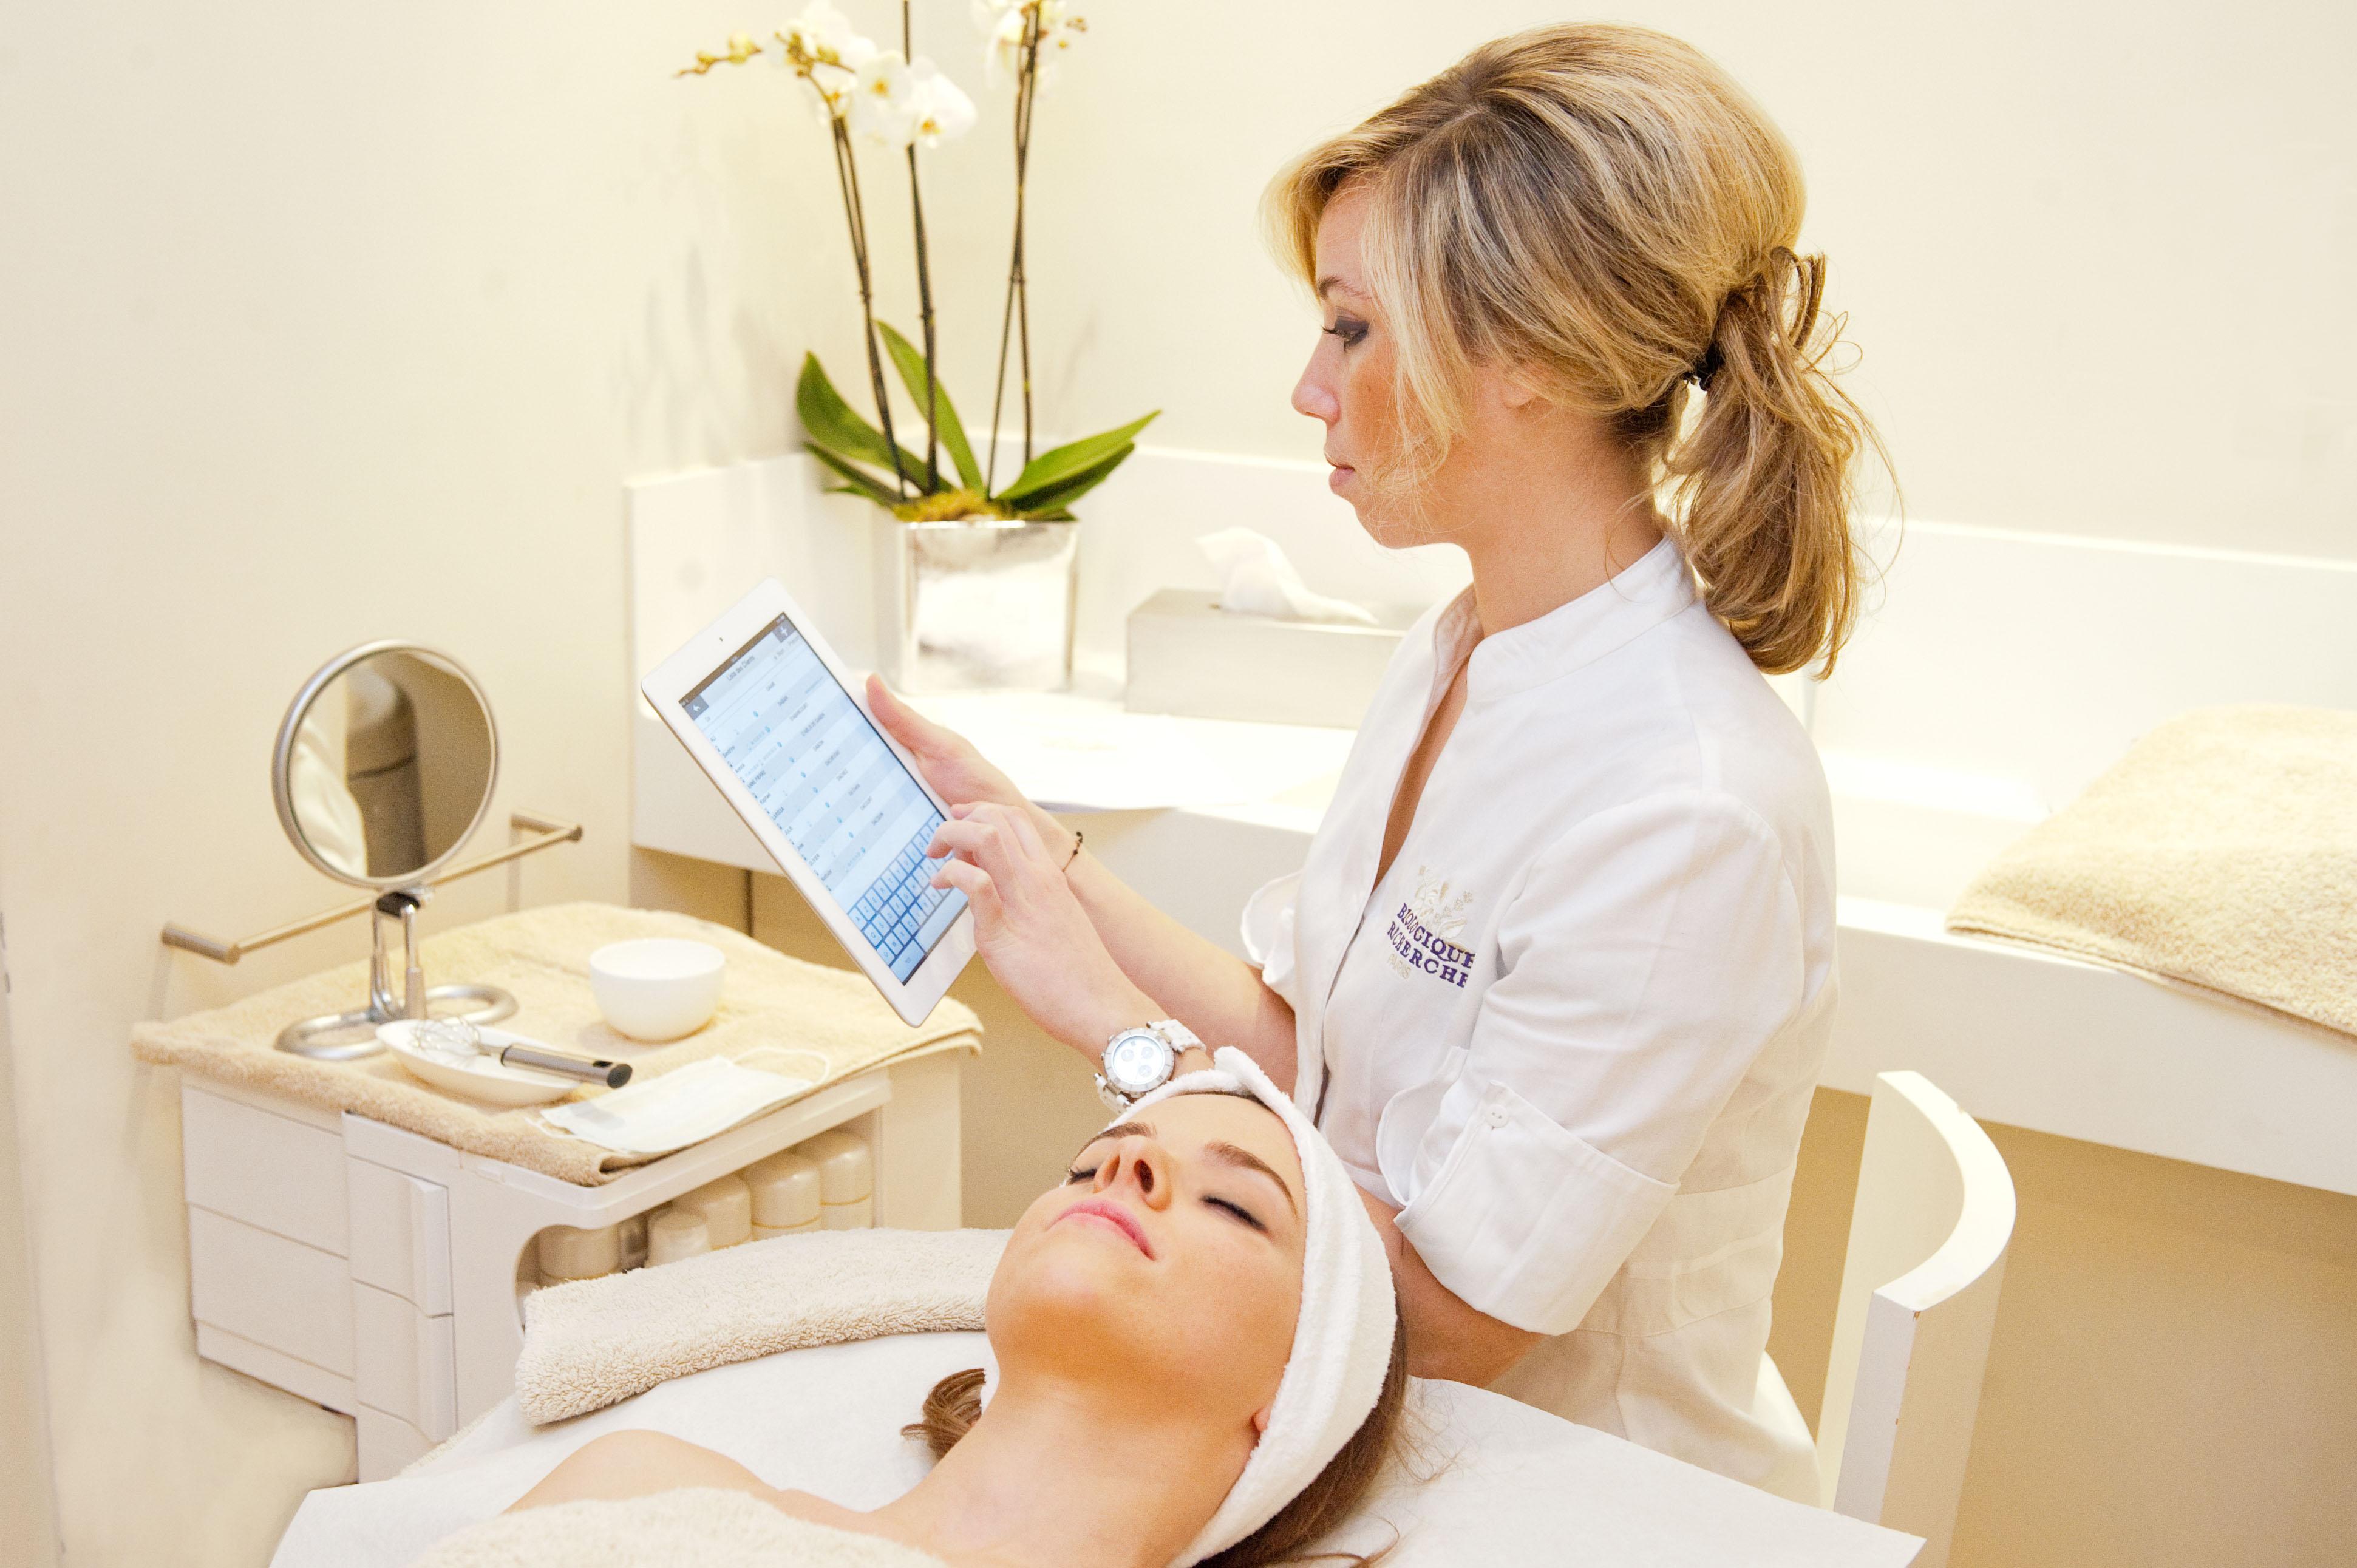 Preoperativni i postoperativni tretmani i nega kod medicinsko-estetskih intervencija - Studio Jasna kozmeticki salon